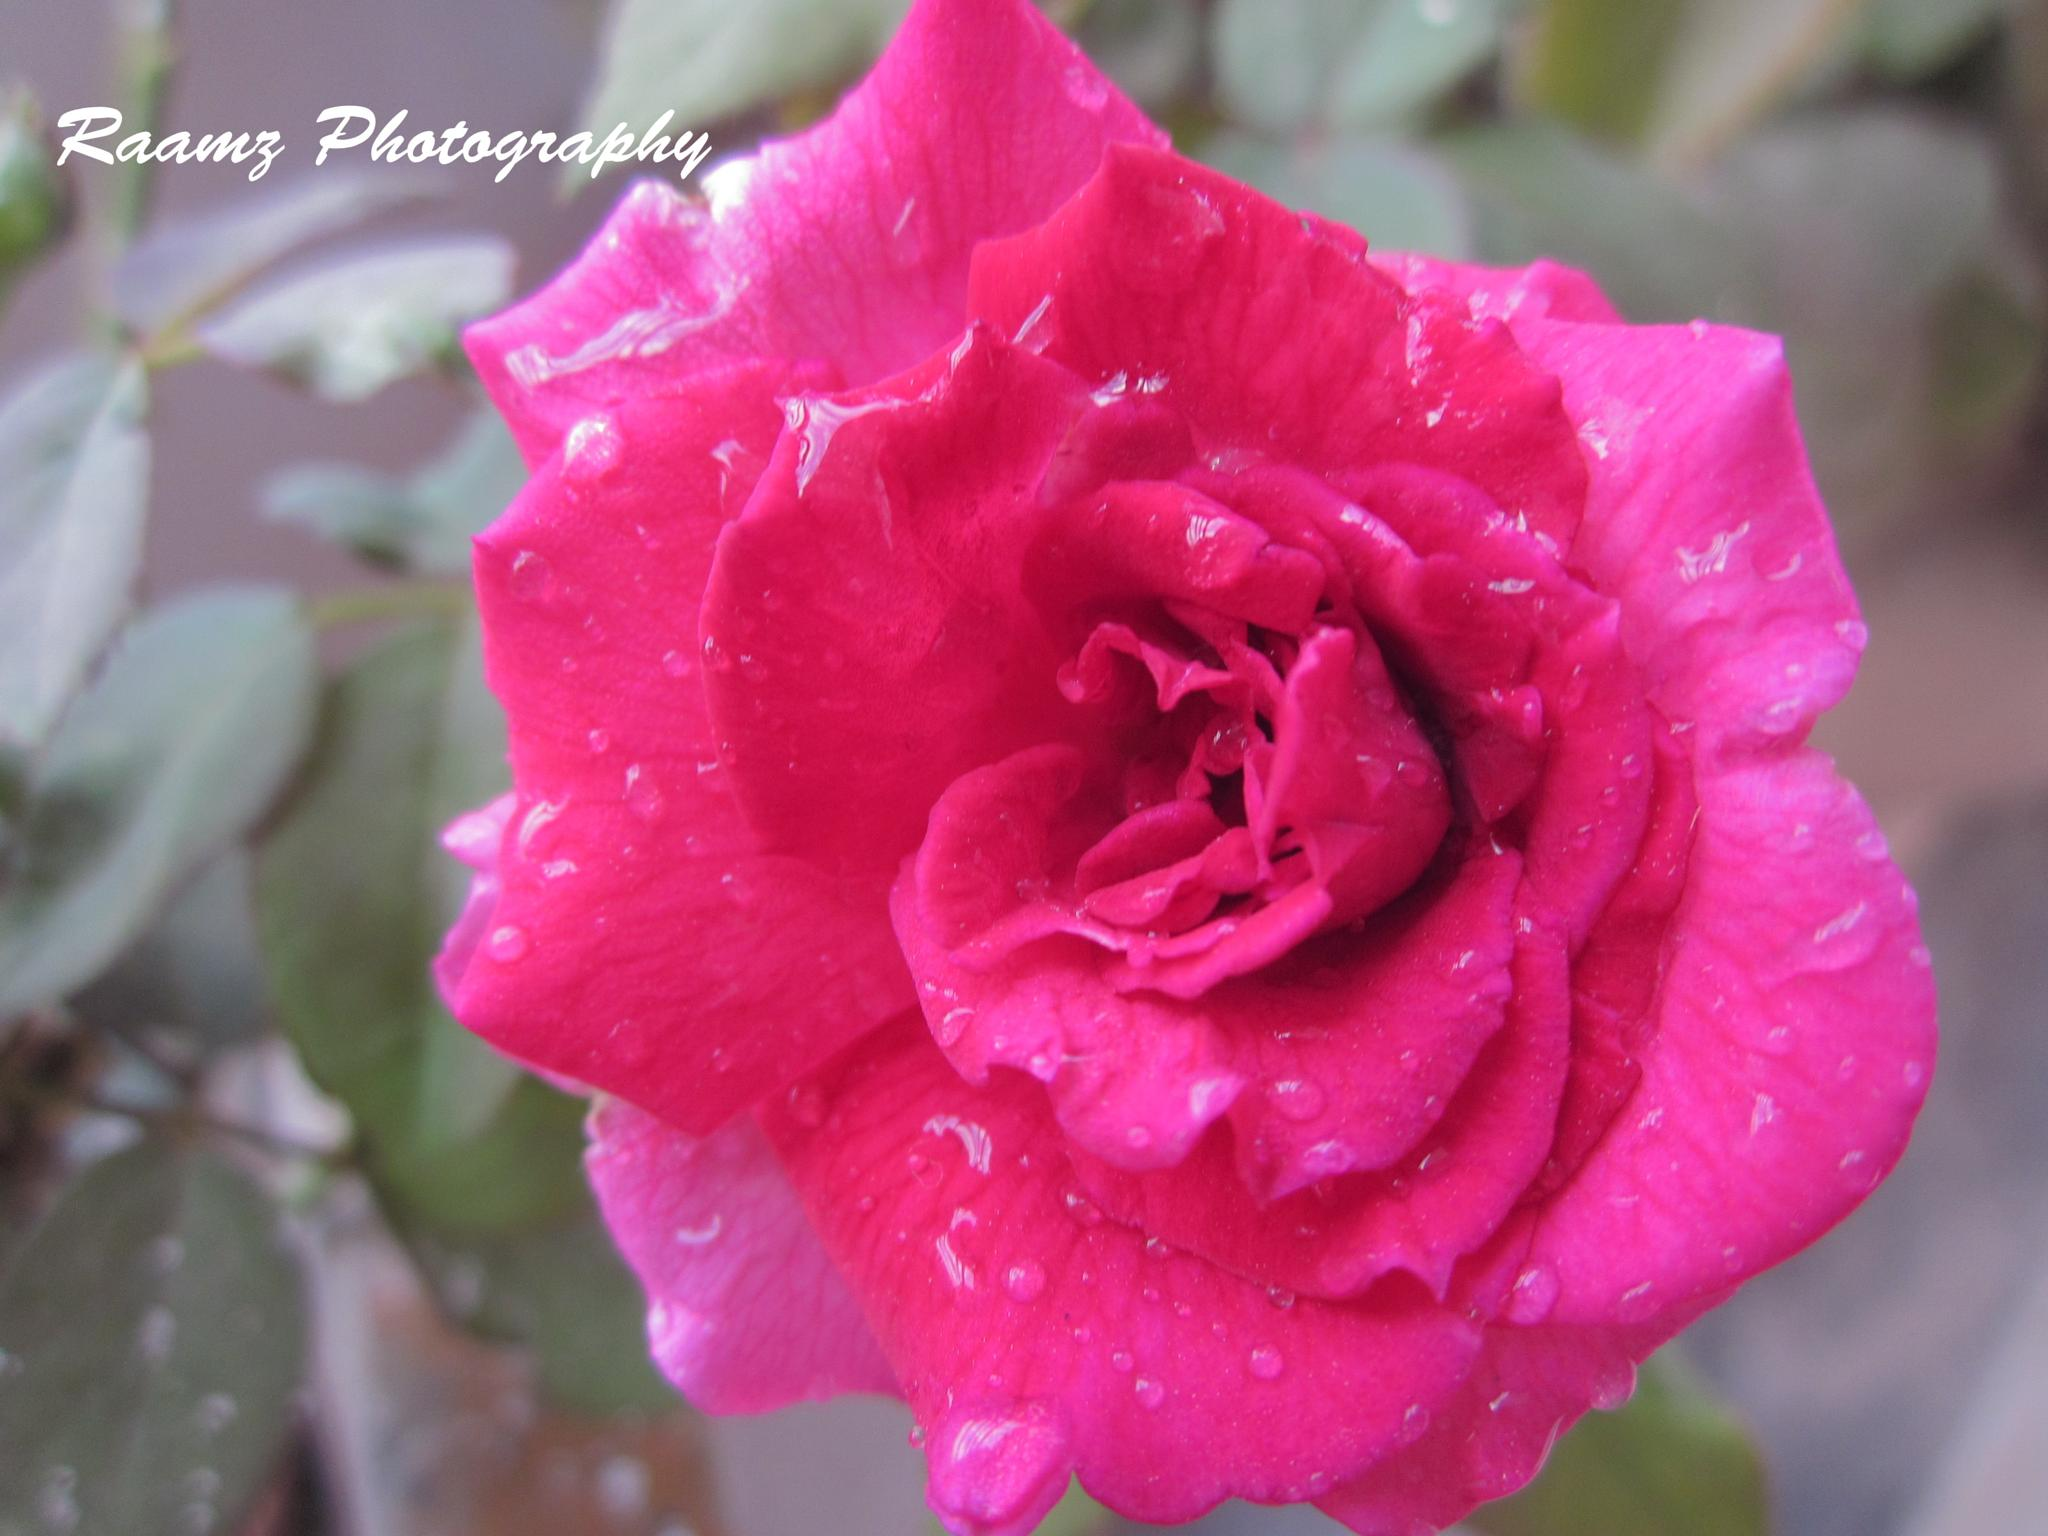 Rose by ramadevireddy